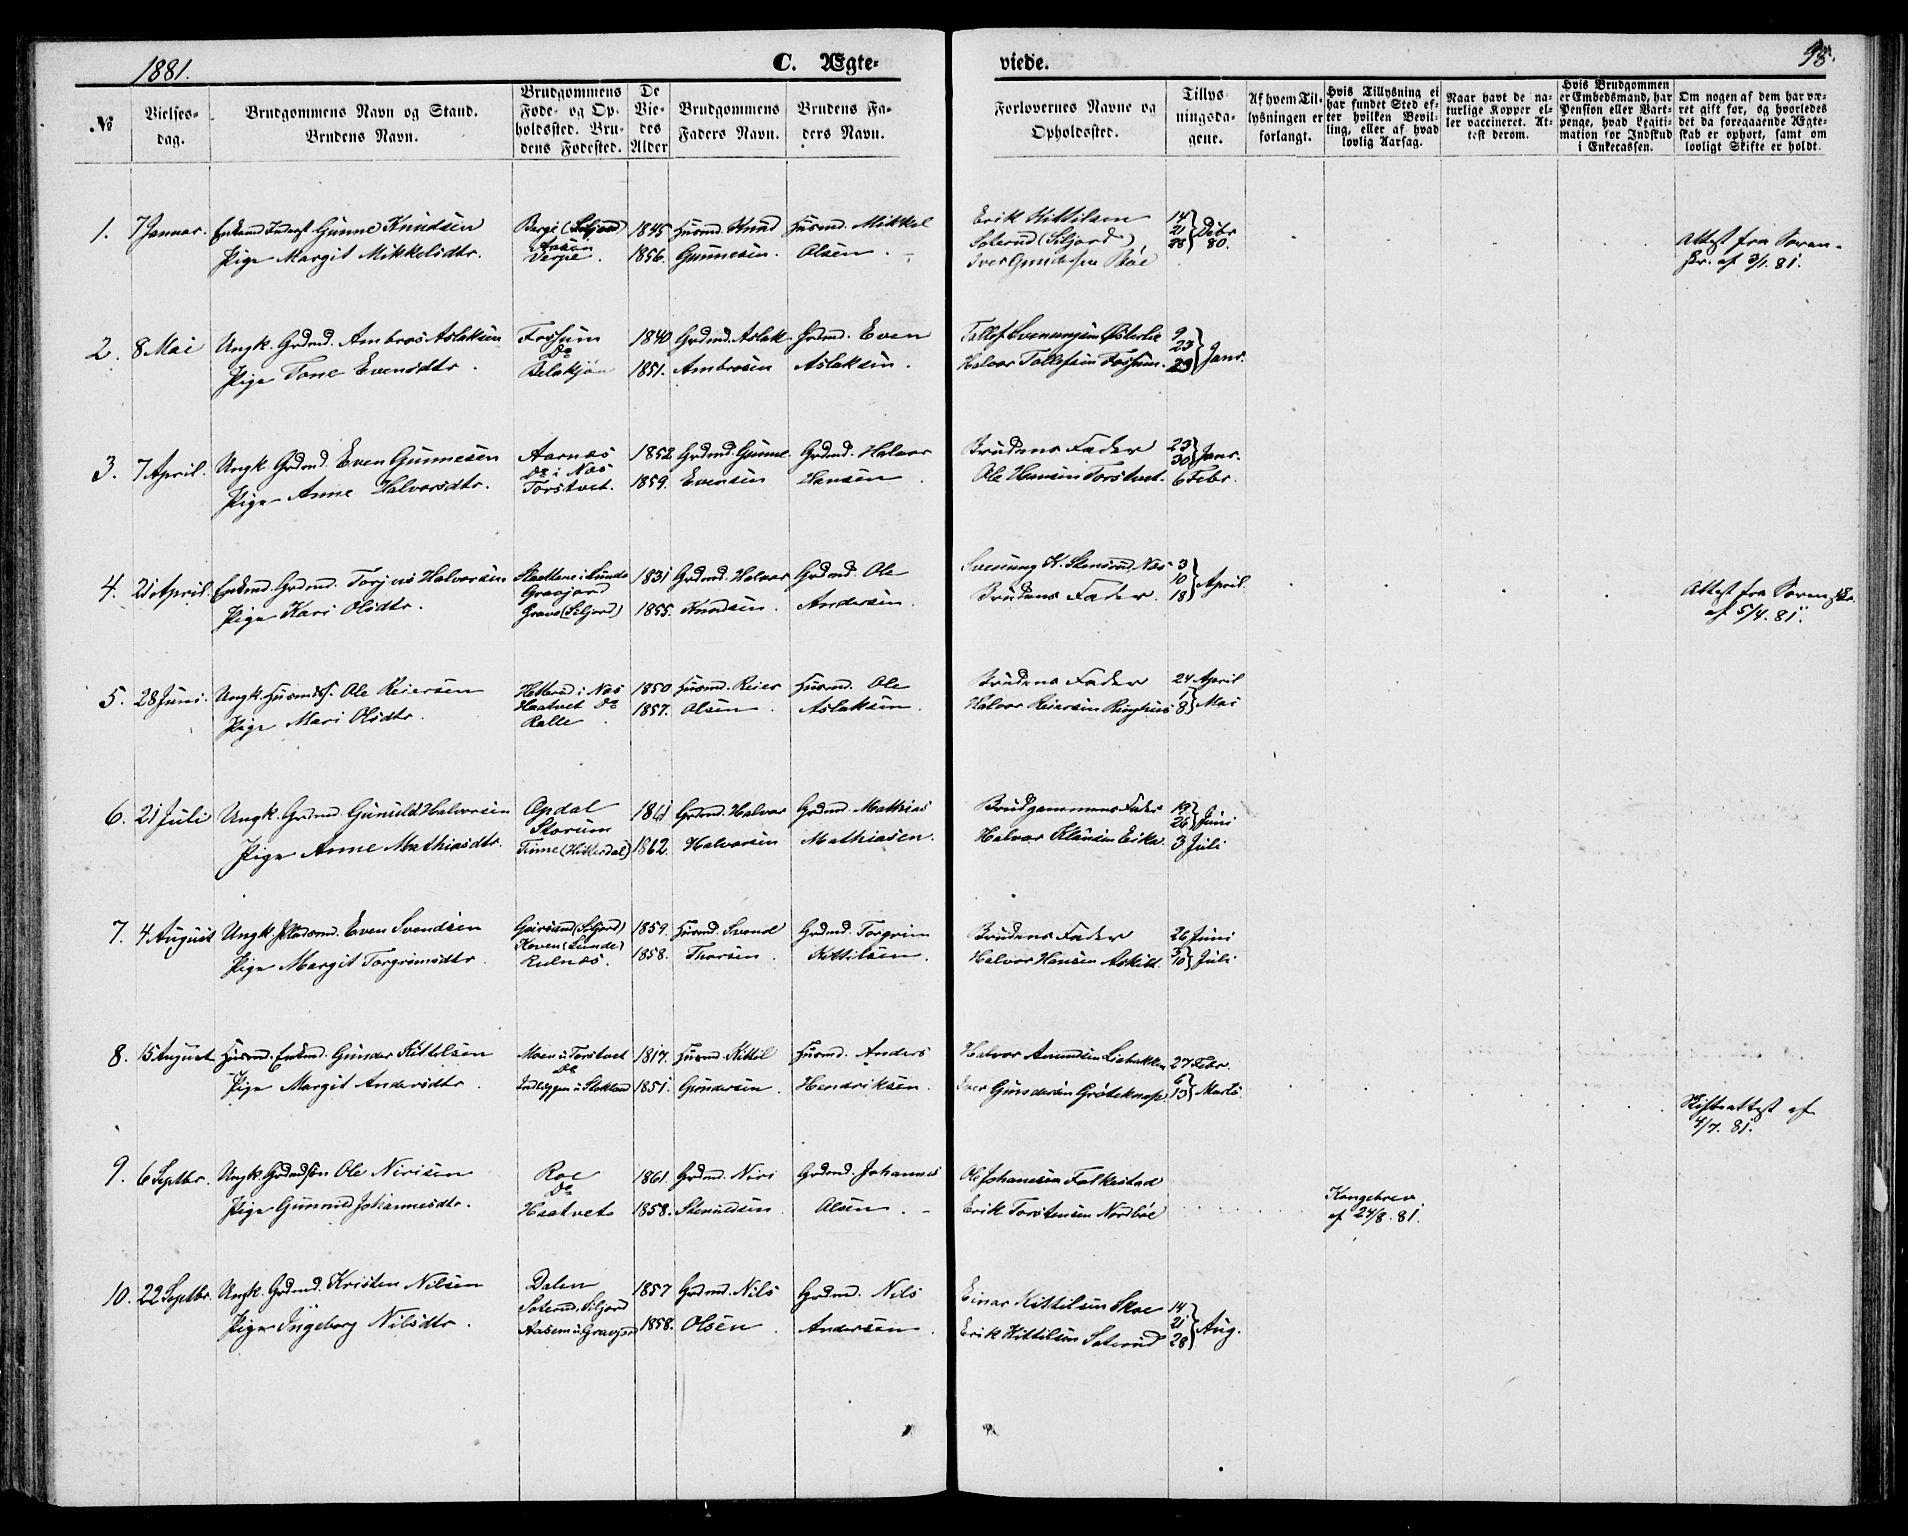 SAKO, Bø kirkebøker, G/Ga/L0004: Klokkerbok nr. 4, 1876-1882, s. 98